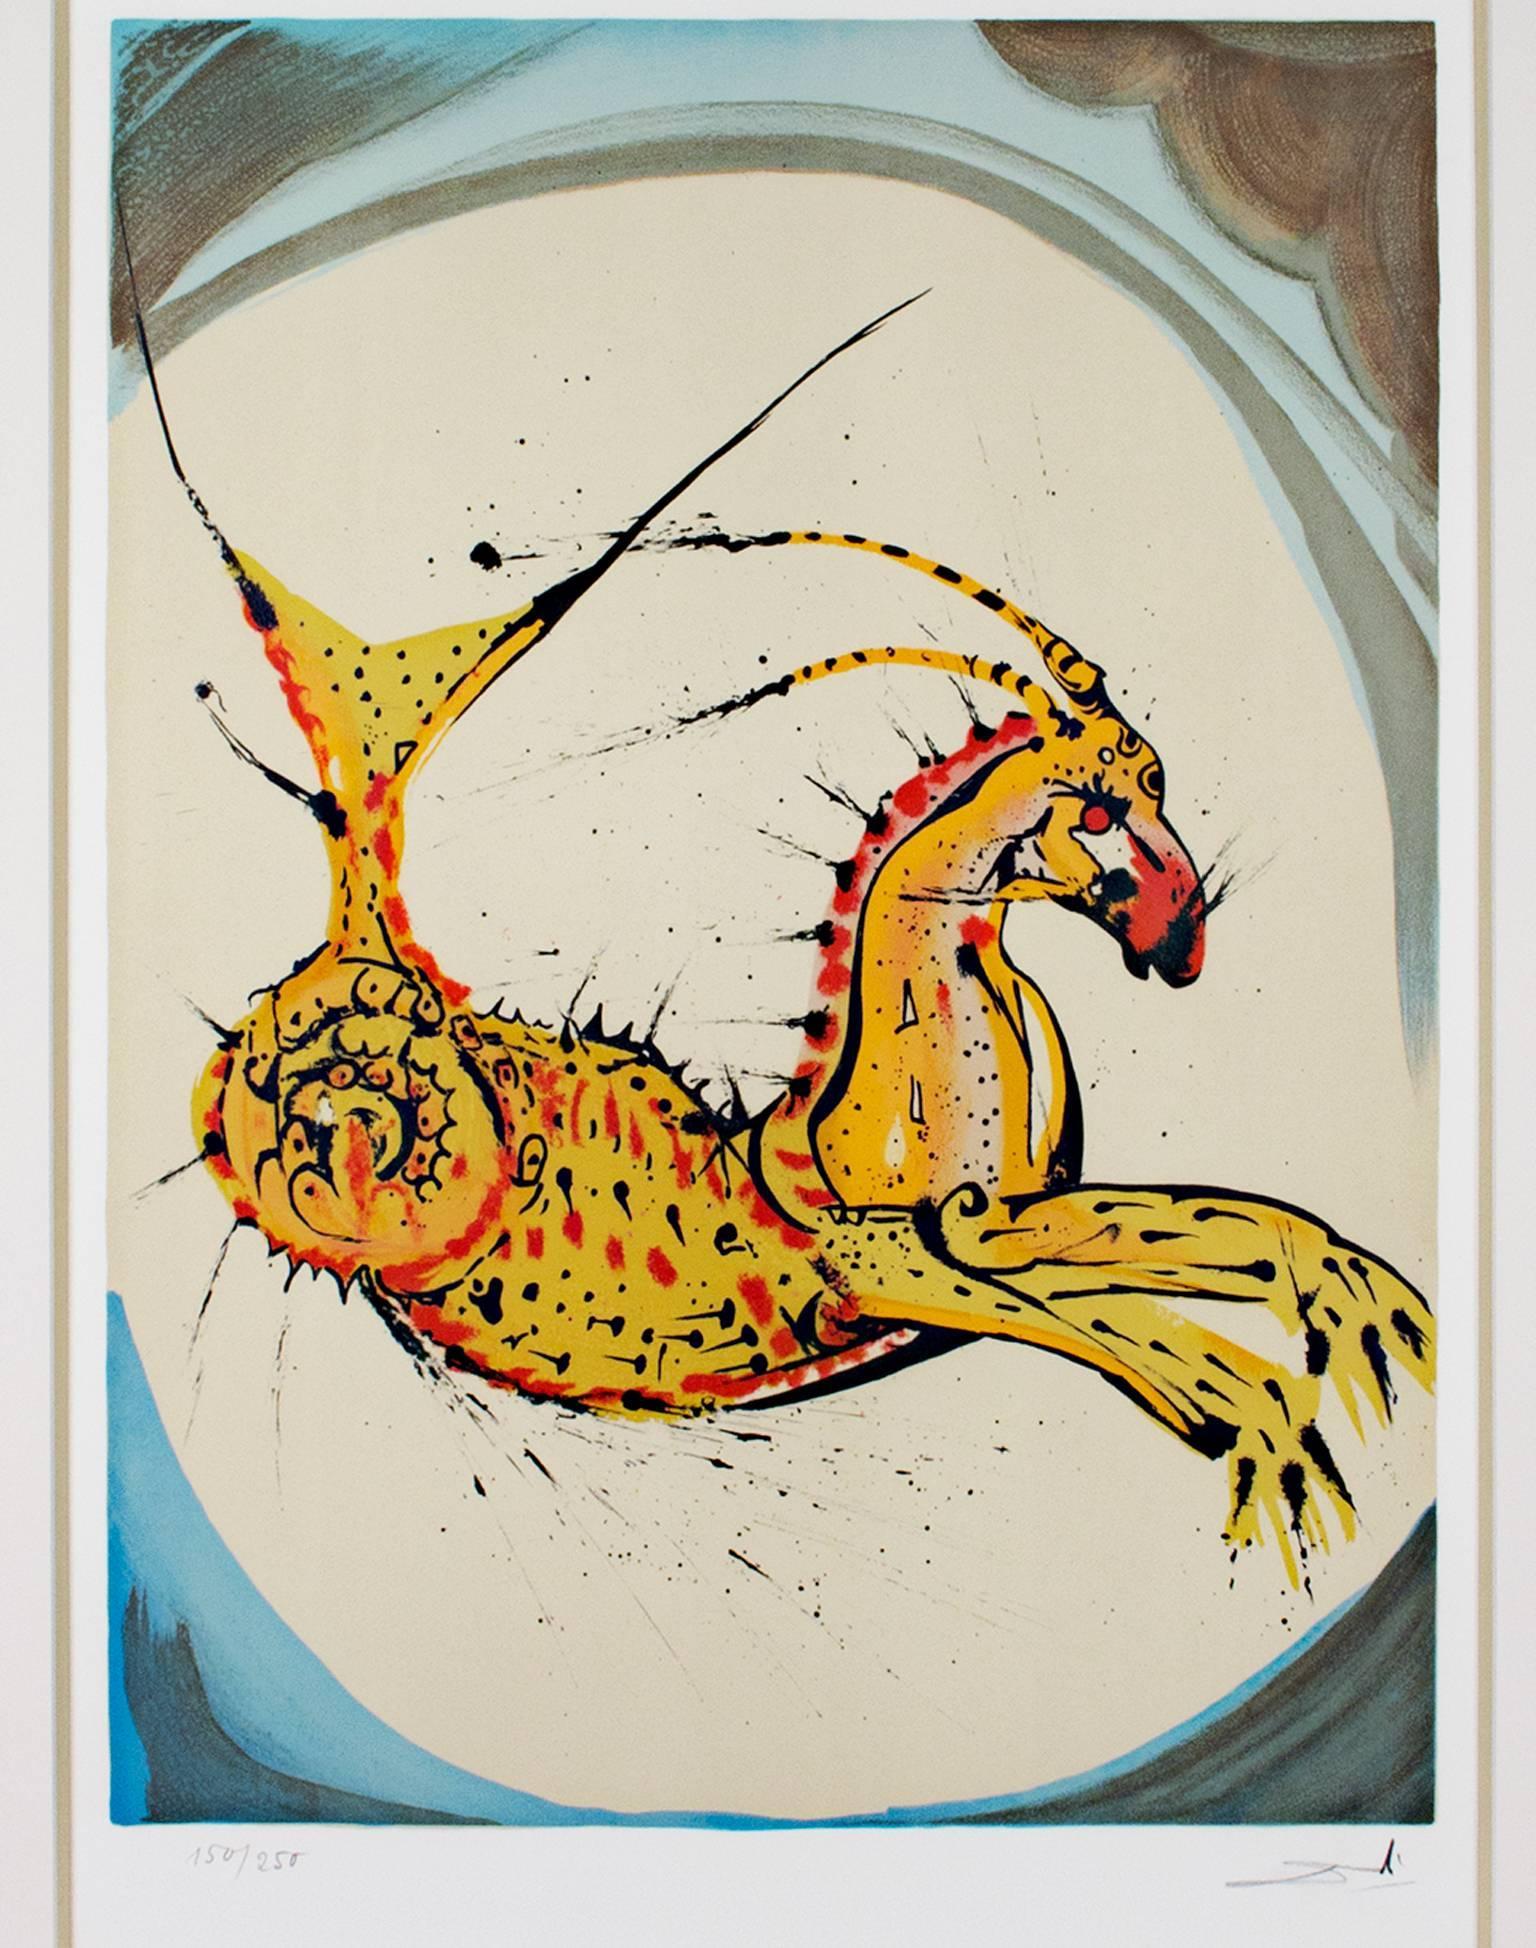 """Signs of the Zodiac Series: Capricorn"" a Original Litho signed by Salvador Dalí"